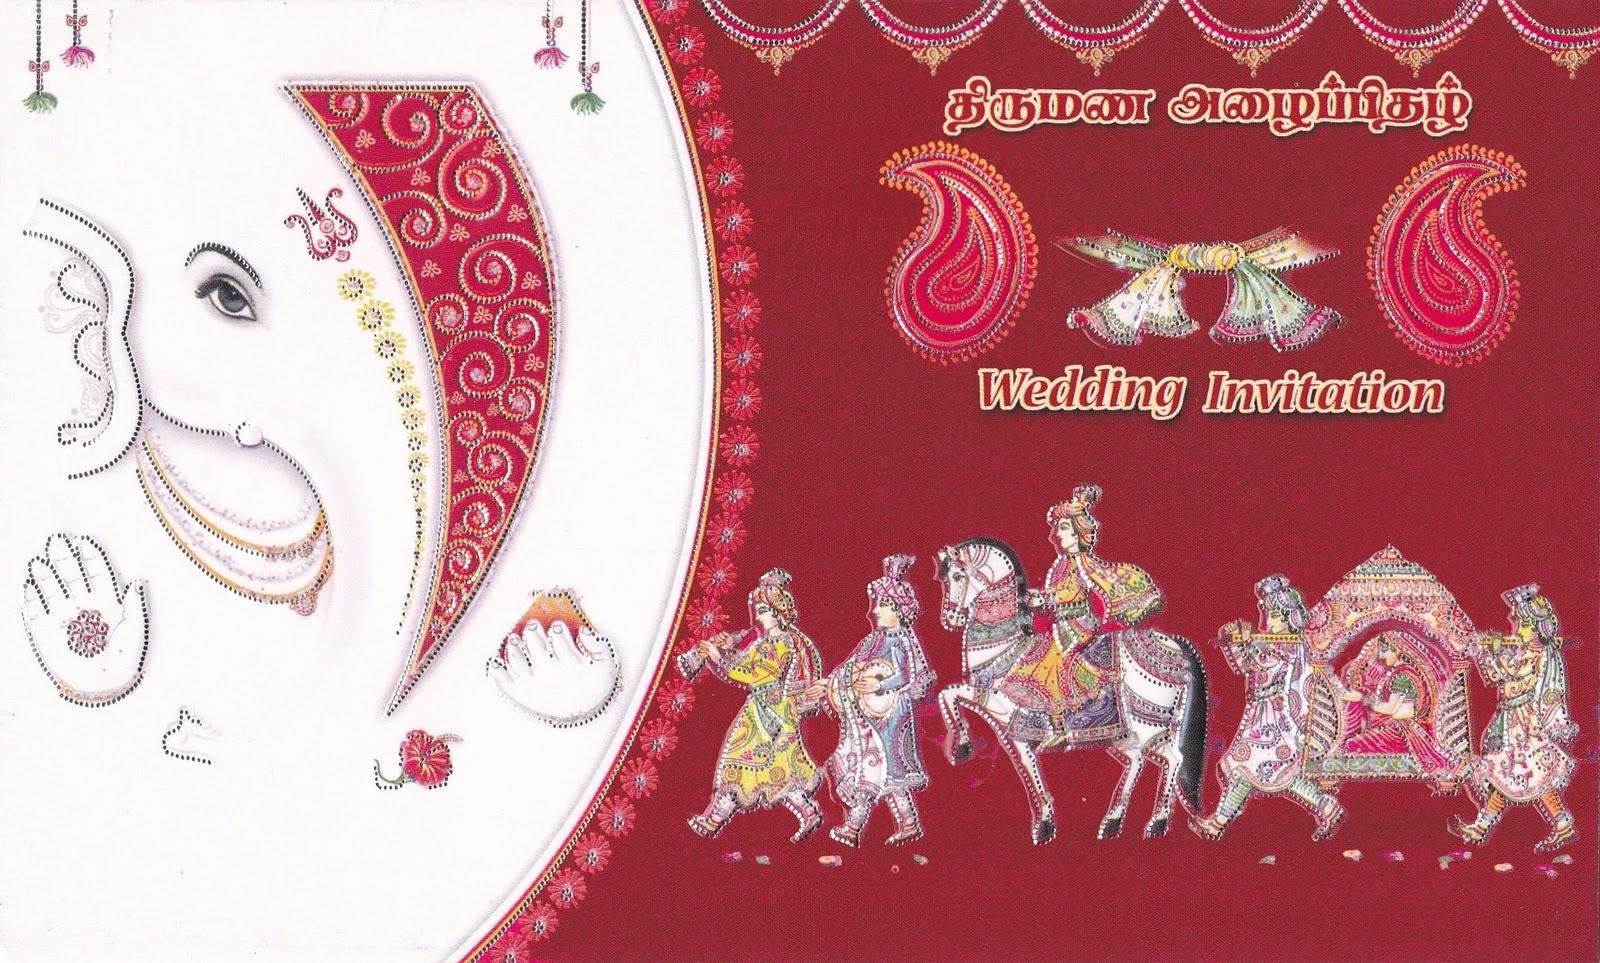 Fancy Wedding Invitation Cards Online Template Vignette ...